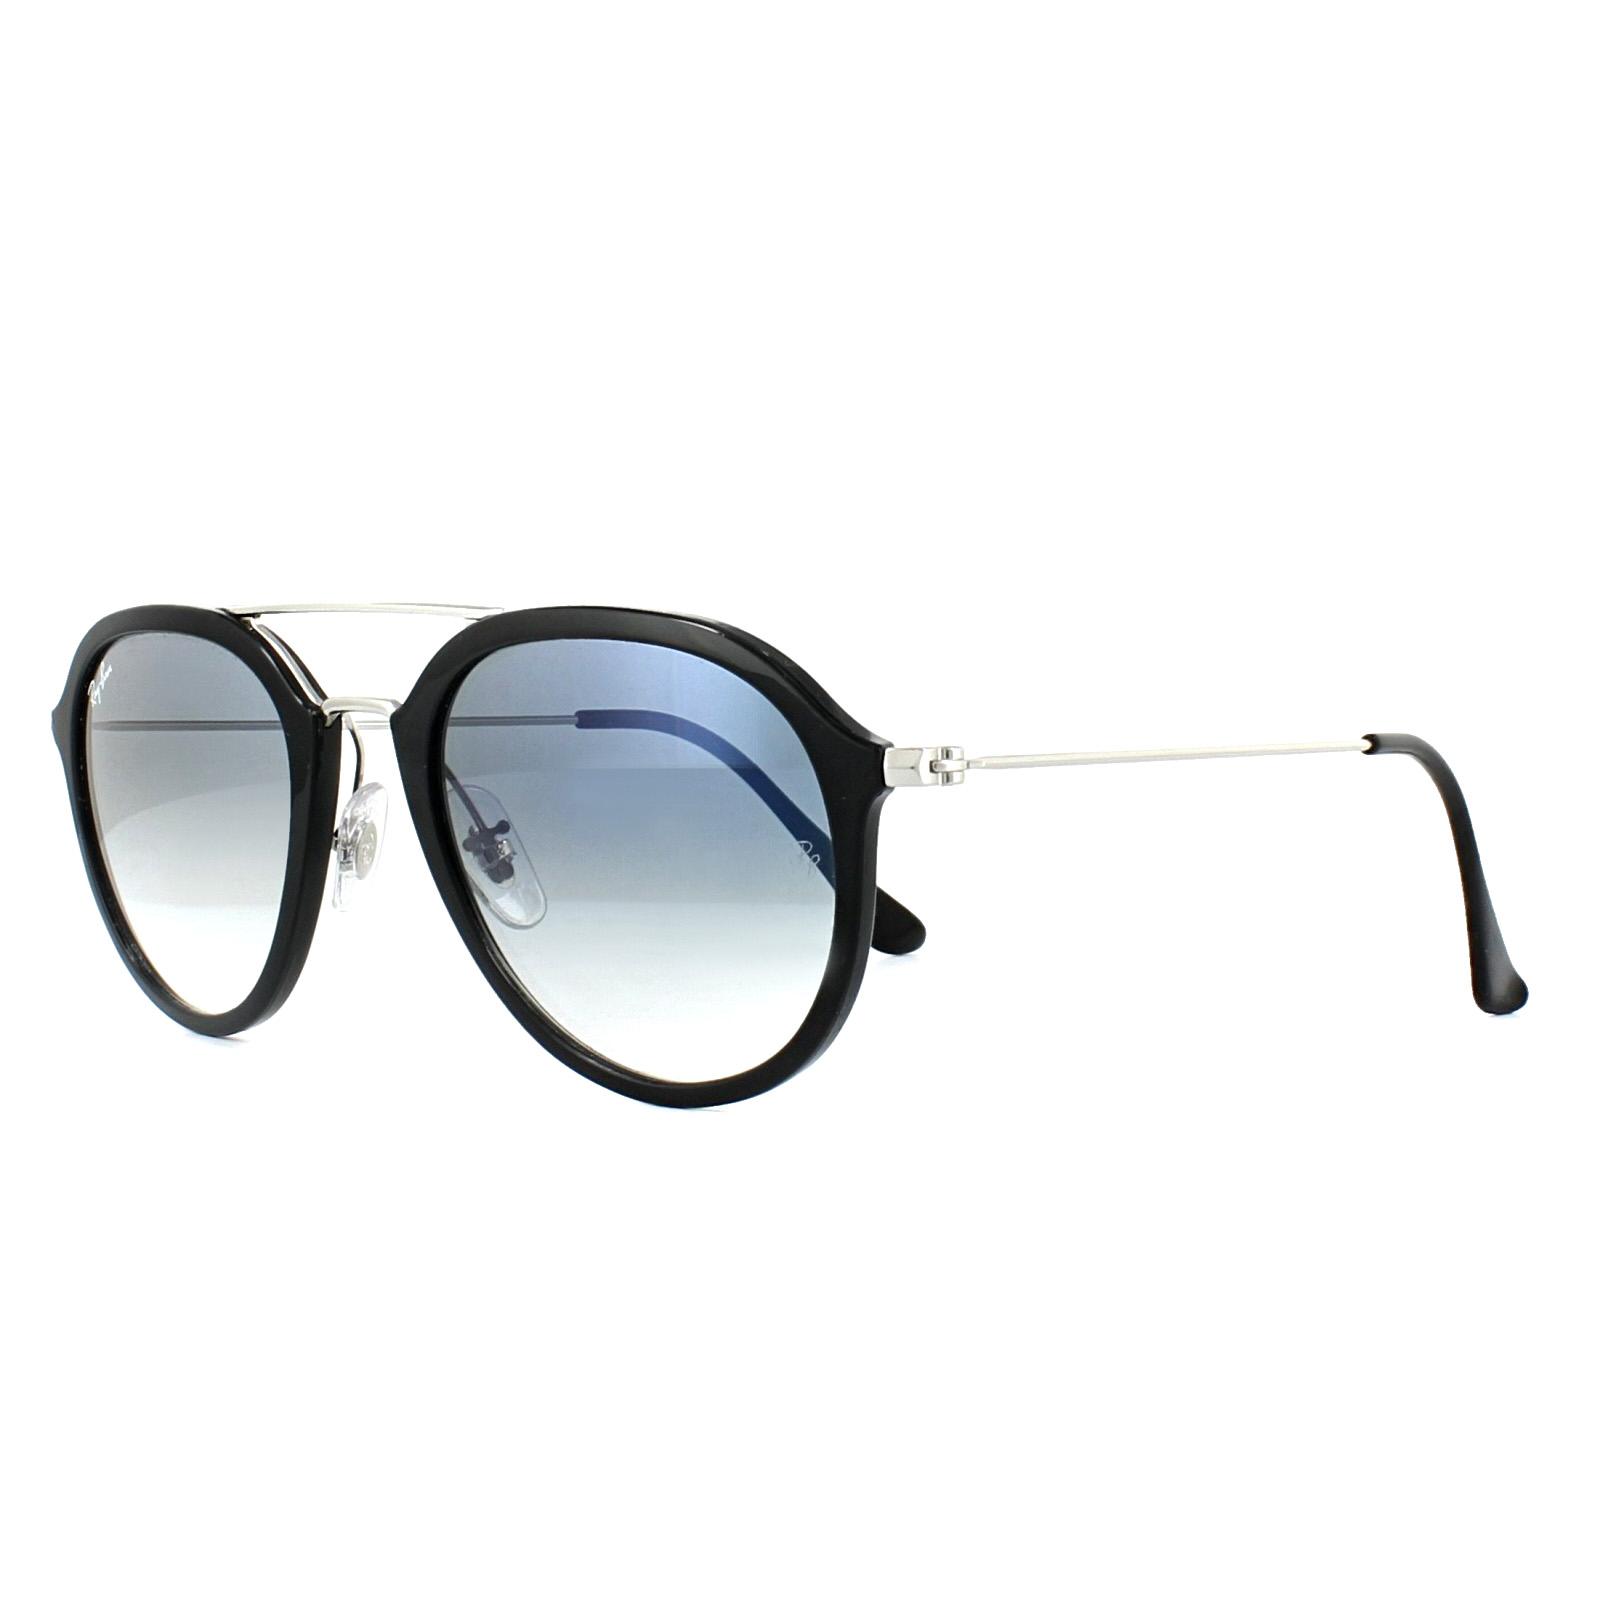 666f9cdd2c ... best sentinel ray ban sunglasses 4253 62923f black silver light blue  gradient 685d9 1e7f2